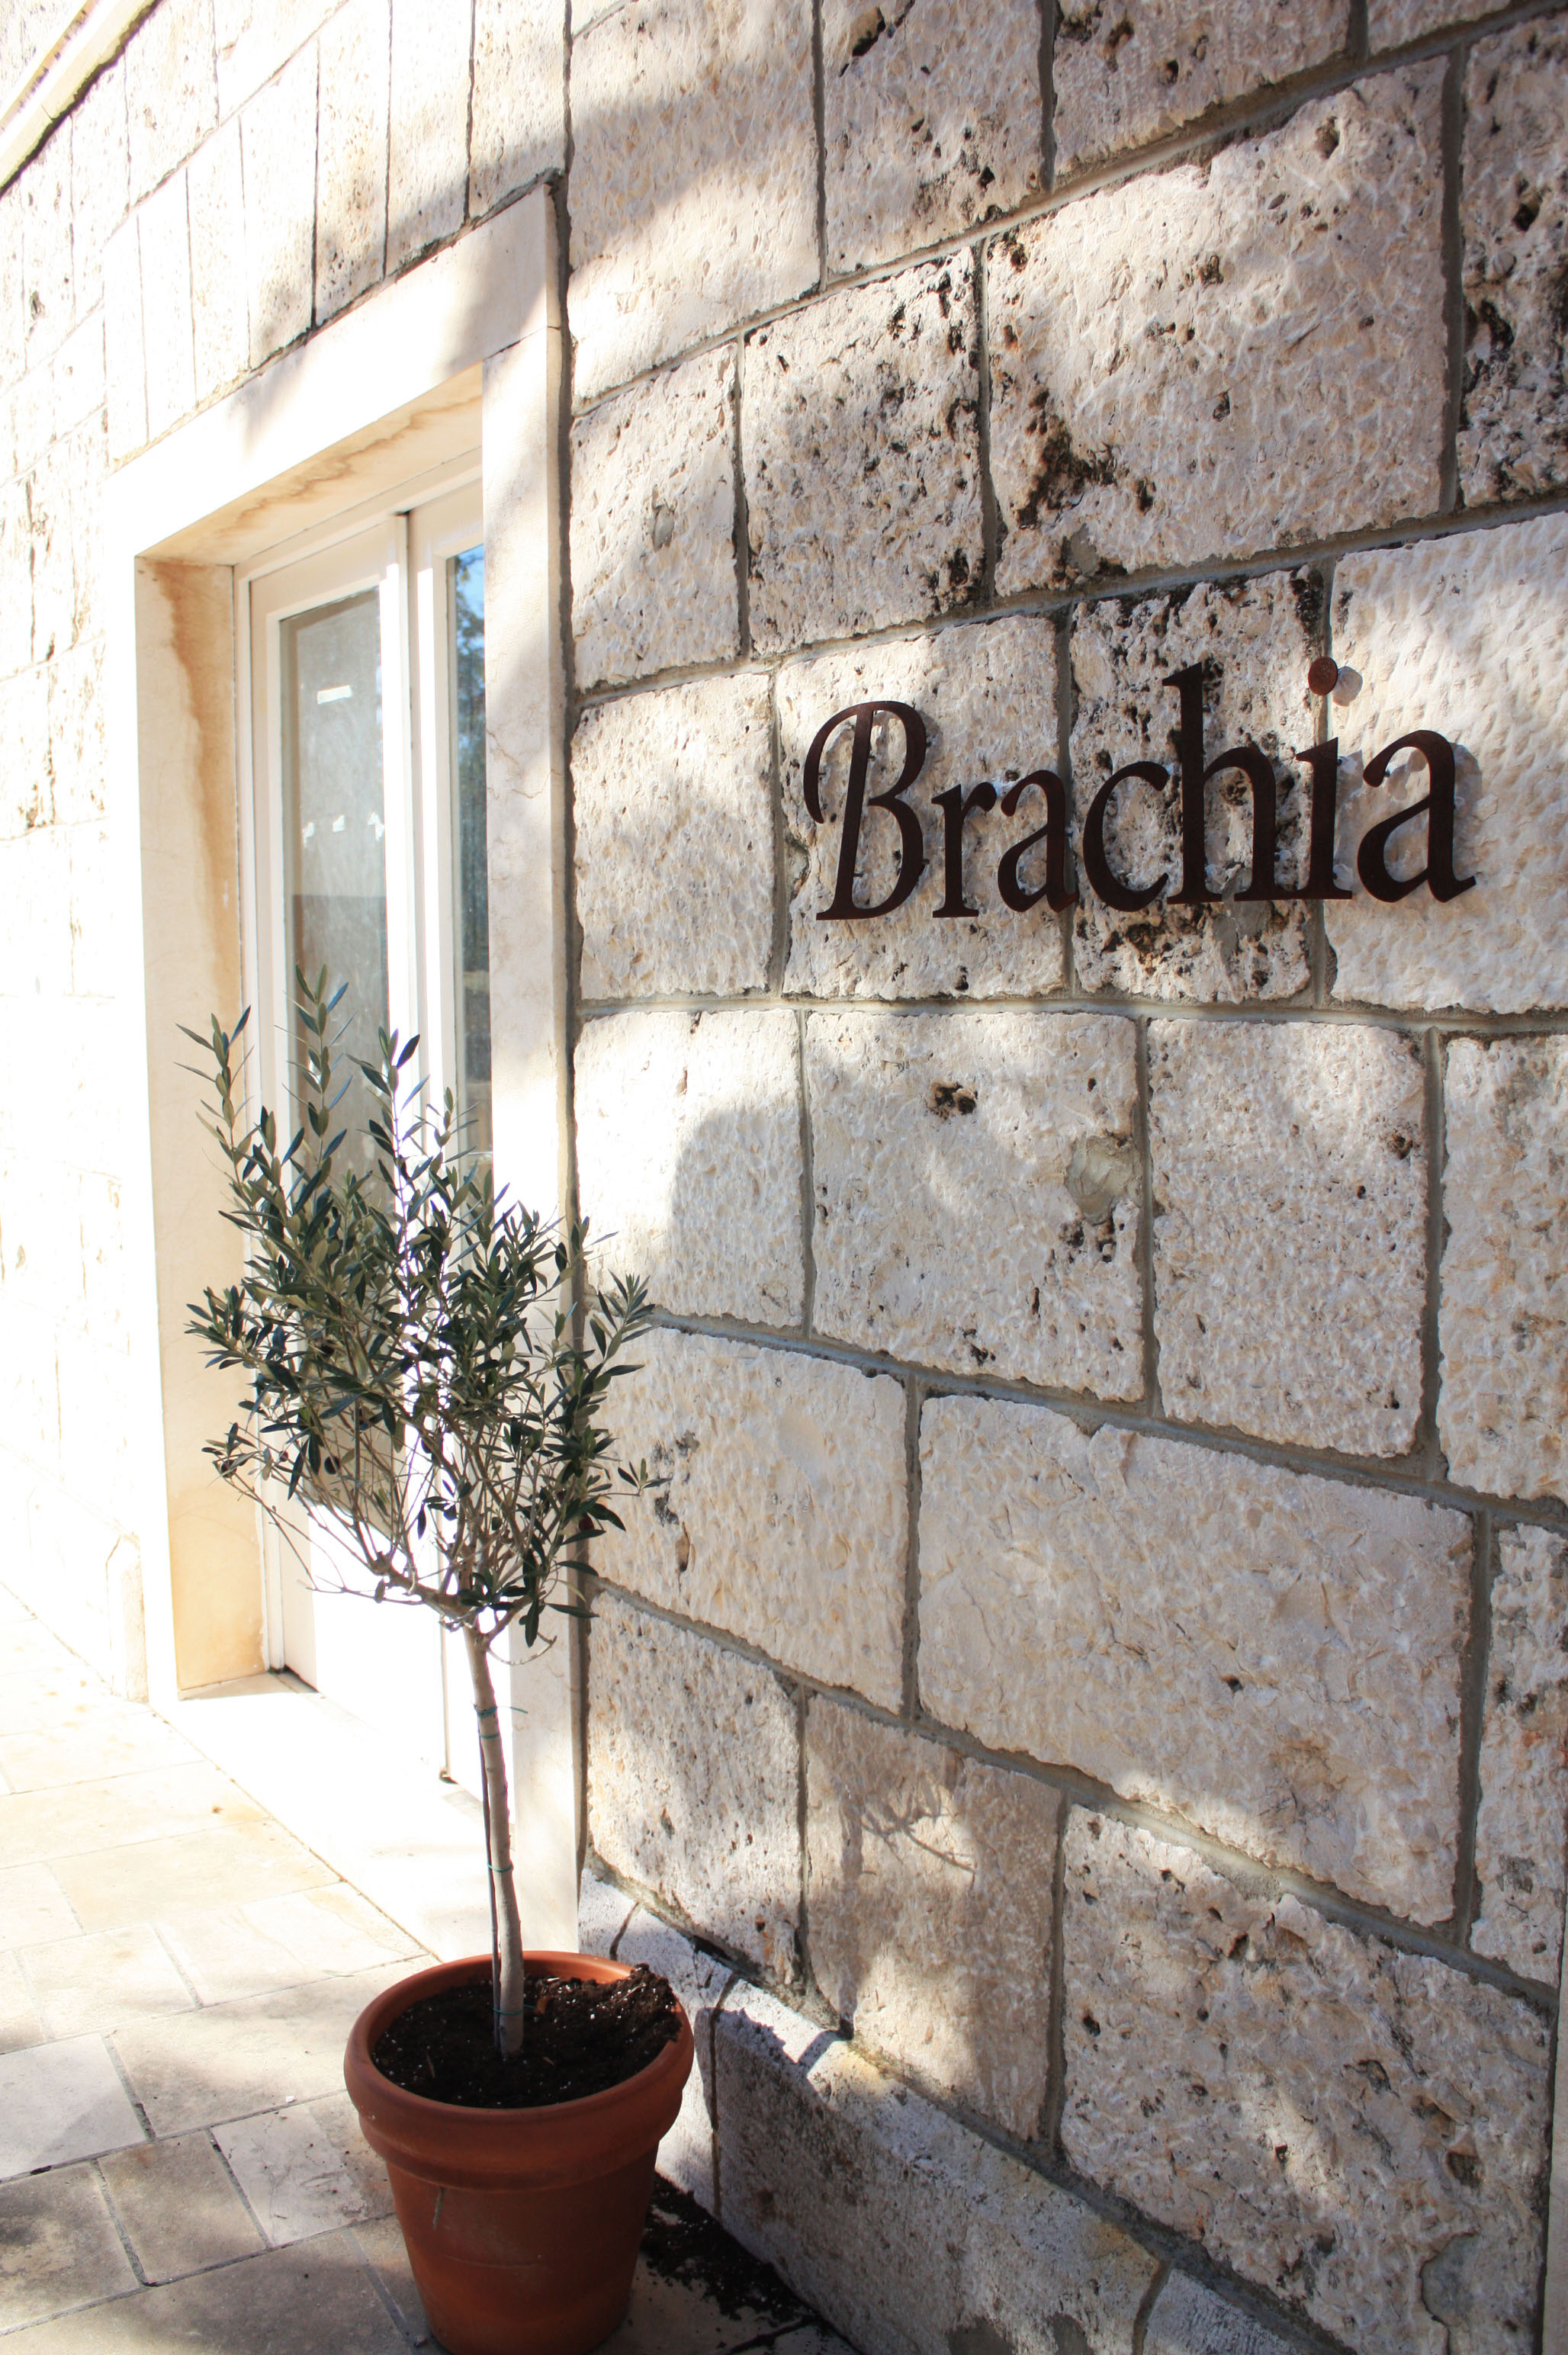 Brachia shop and restaurant in Selca on the island of Brač